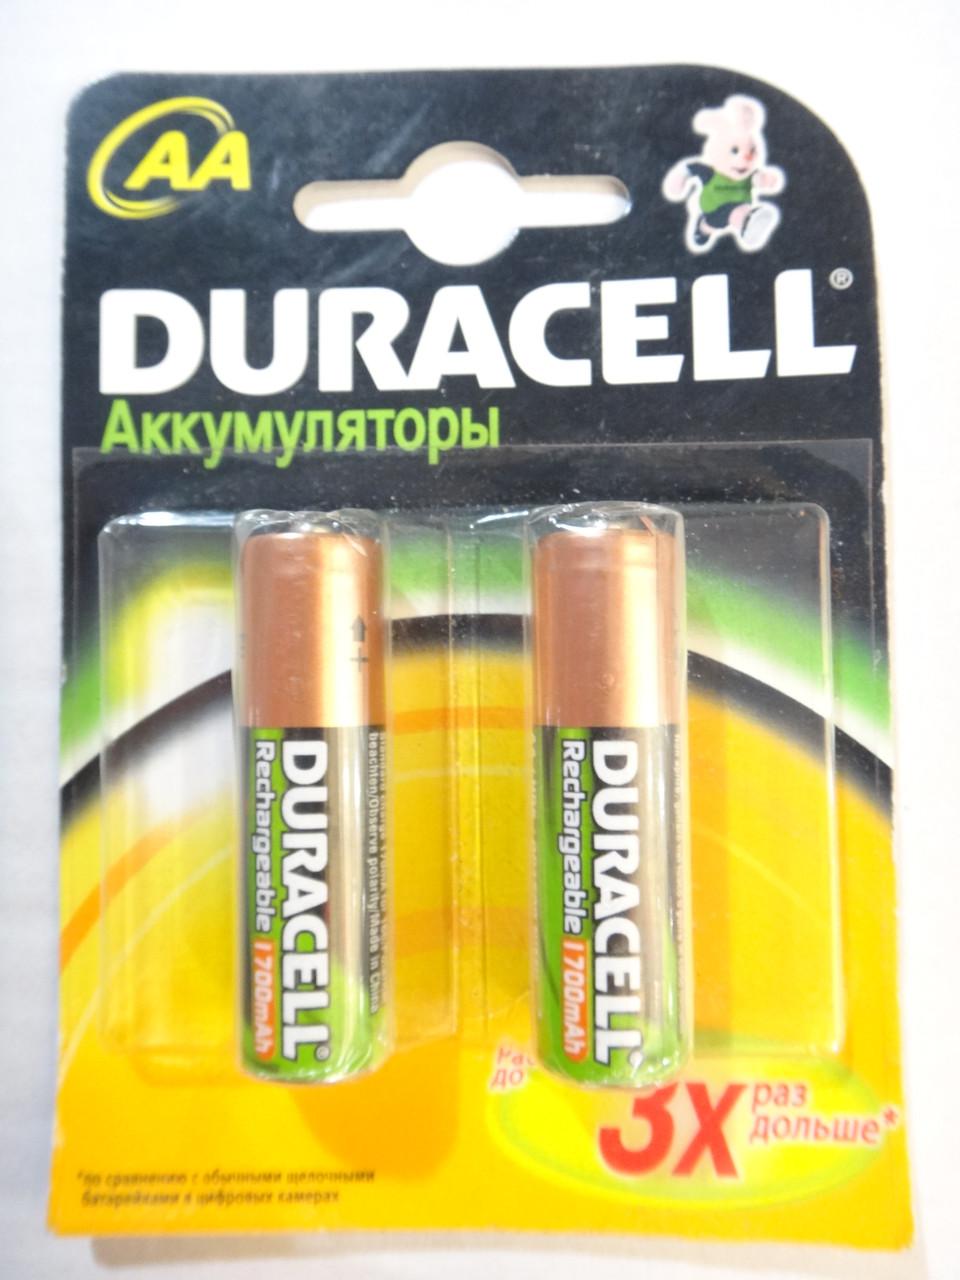 Аккумулятор AA 1700 mAh Duracell 1.2v